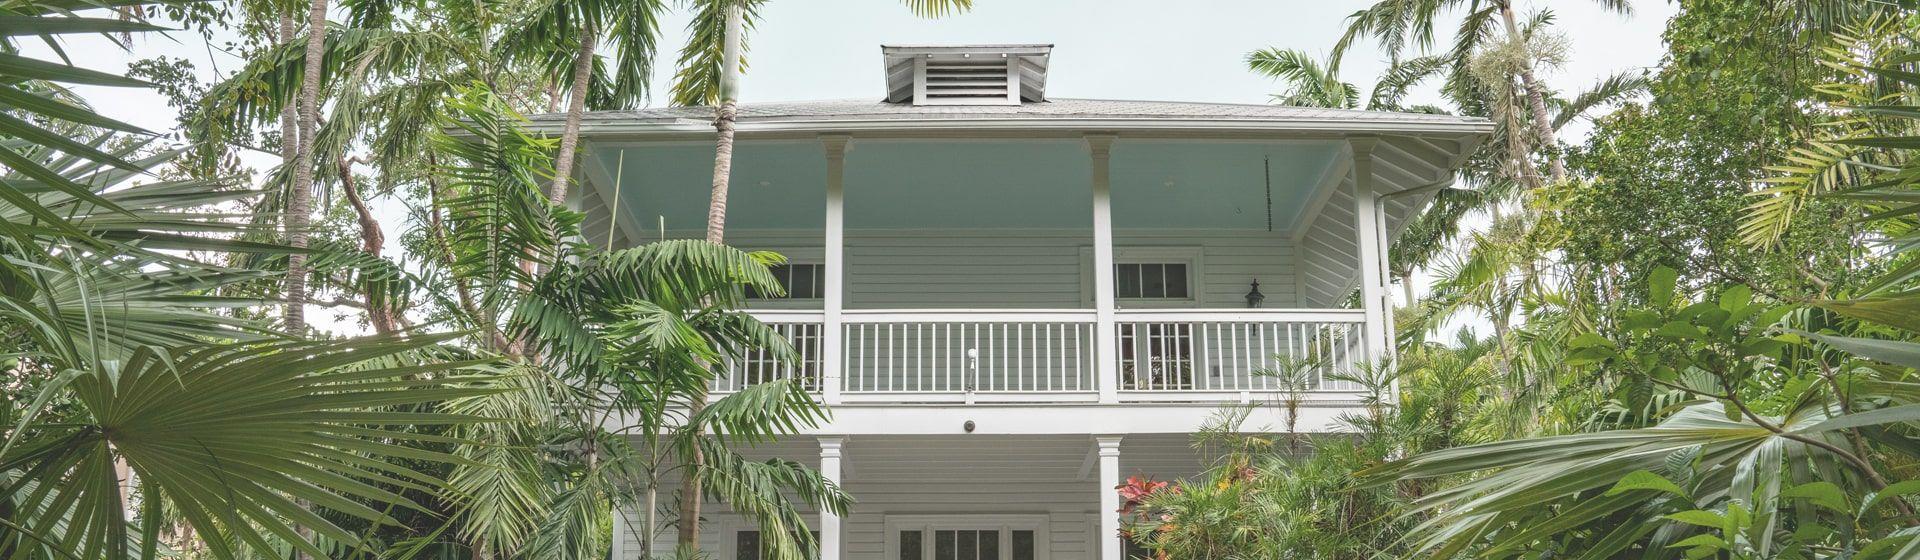 Ferienhausbesitzer bezieht Hartz IV